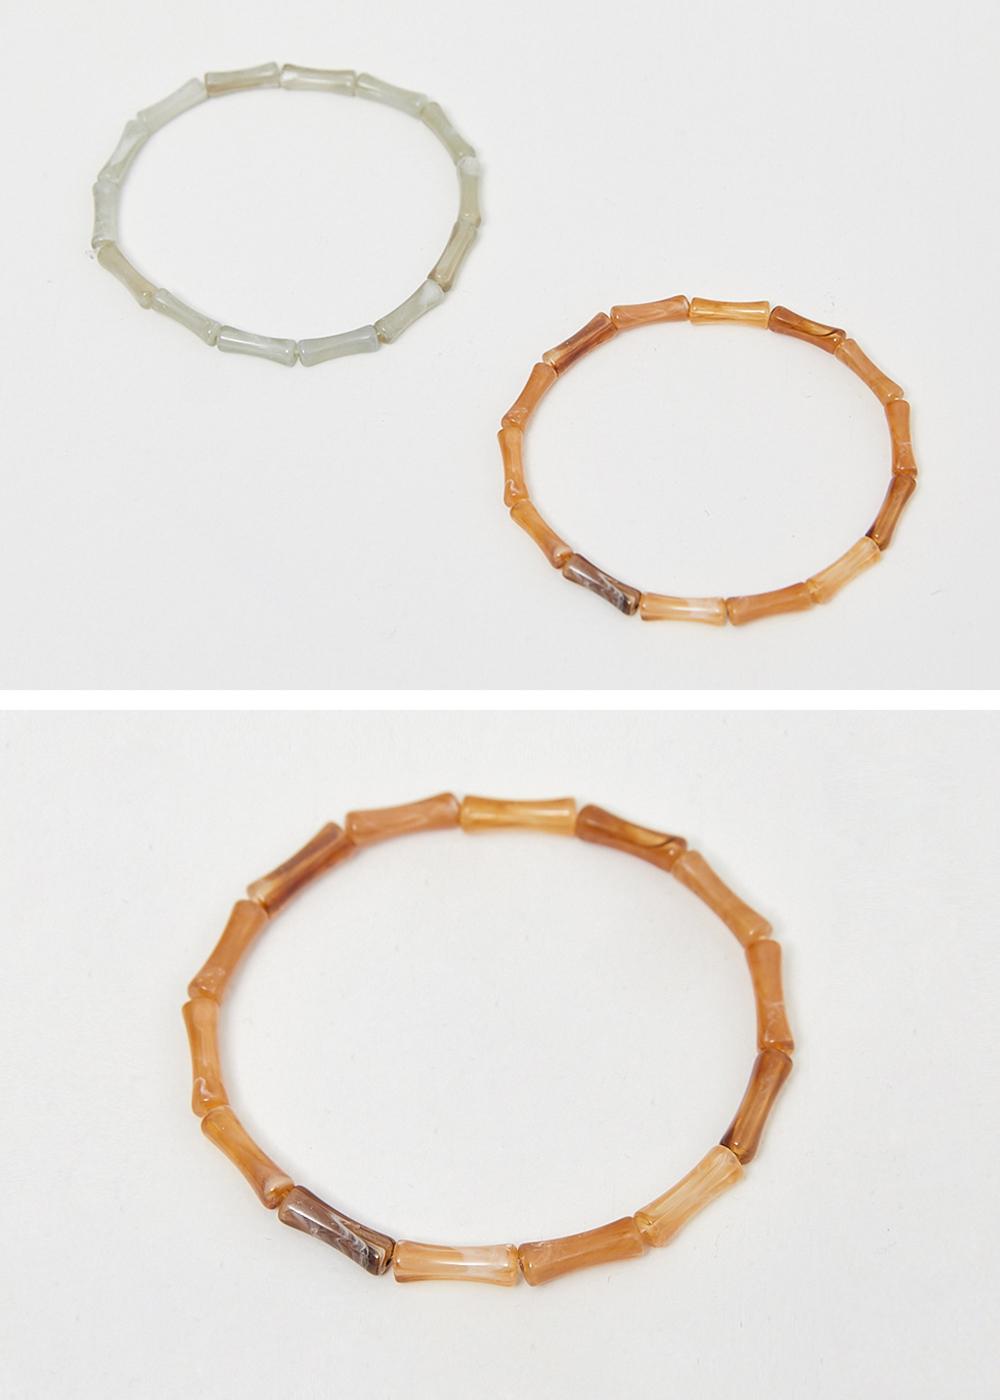 Bamboo beads bracelet